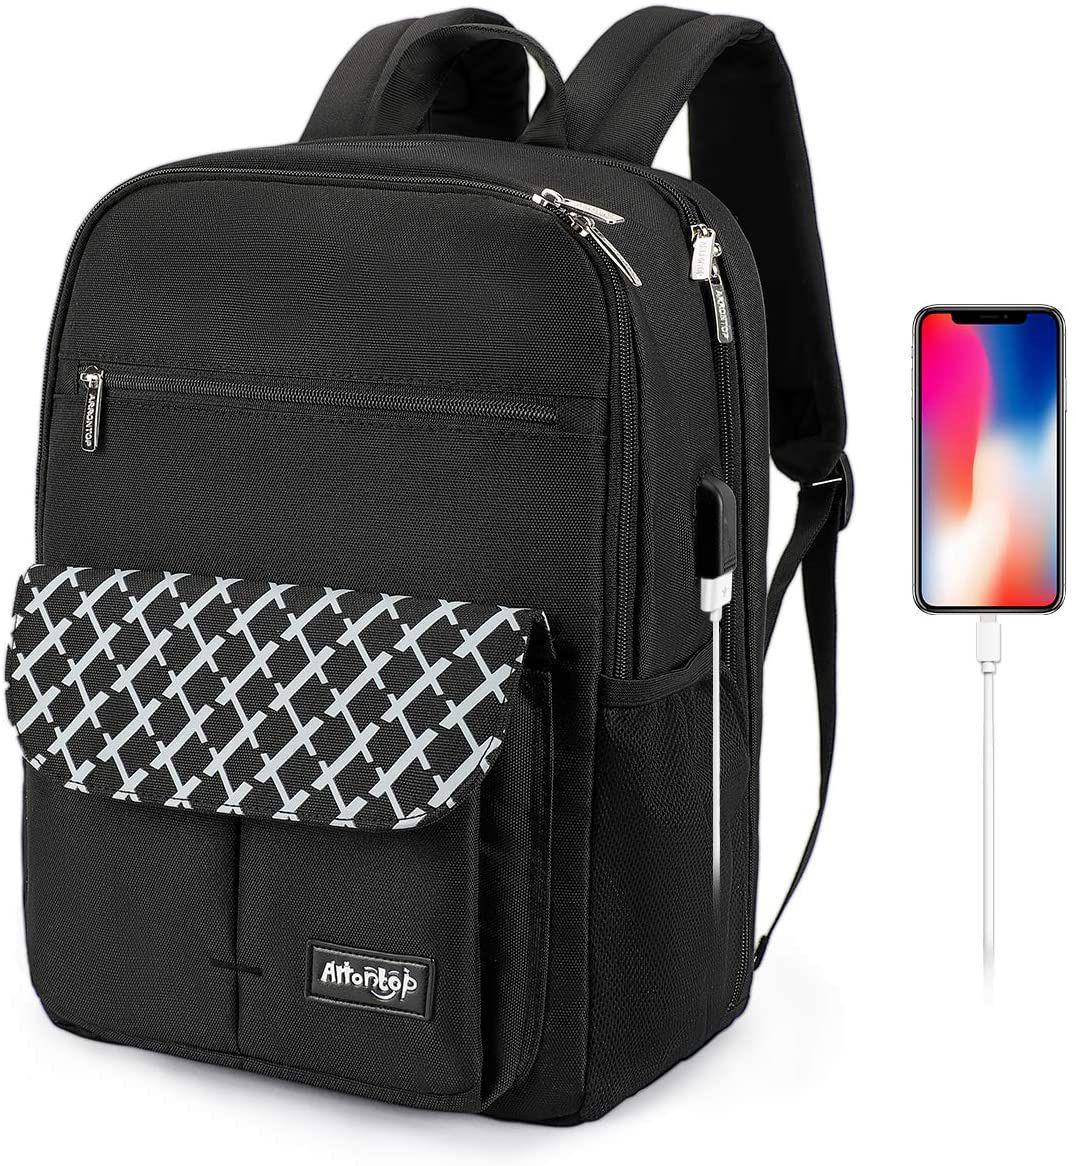 Waterproof Backpack Travel College Bookbags Fits 15.6 inch